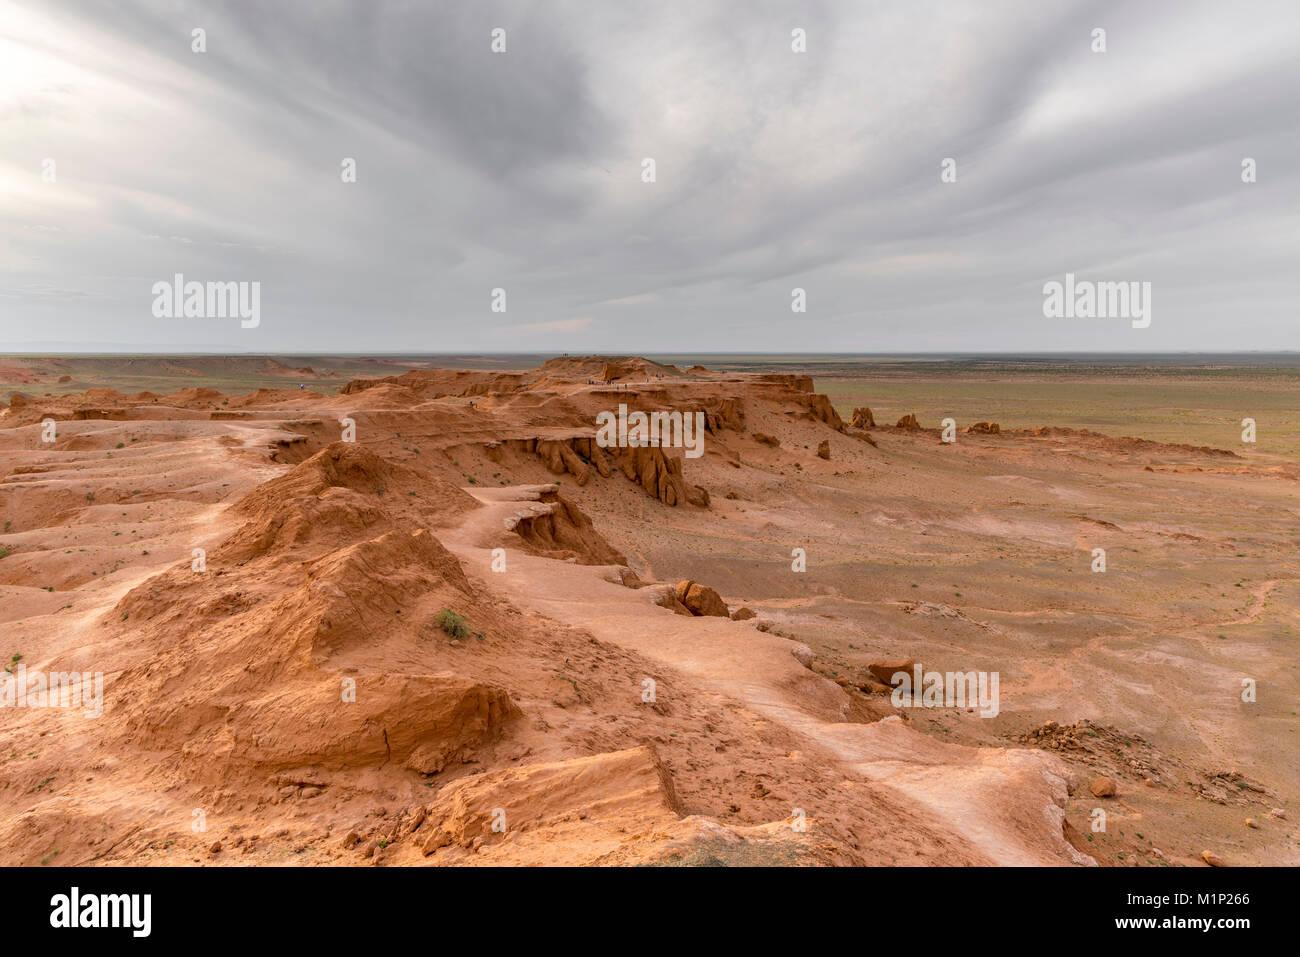 Flaming cliffs, Bajanzag, al sur de la provincia de Gobi, Mongolia, Asia Central, África Imagen De Stock